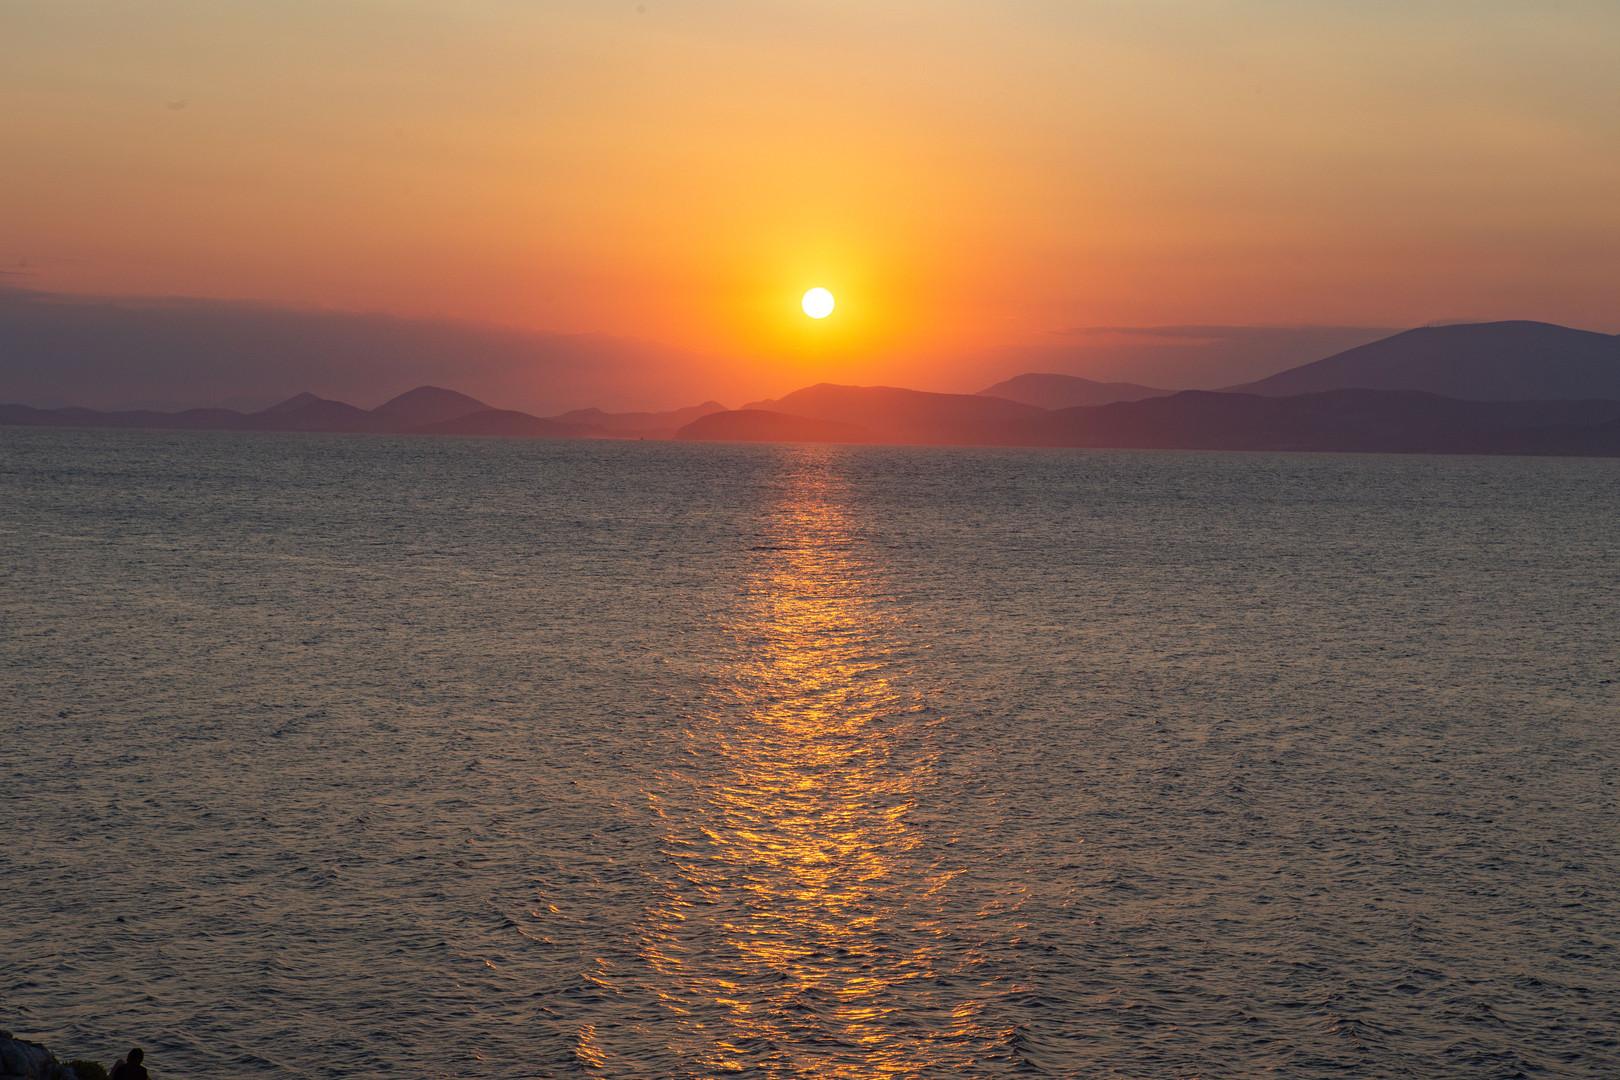 -IMG_0541- TOMMY HILFIGER GREECE SUMMER